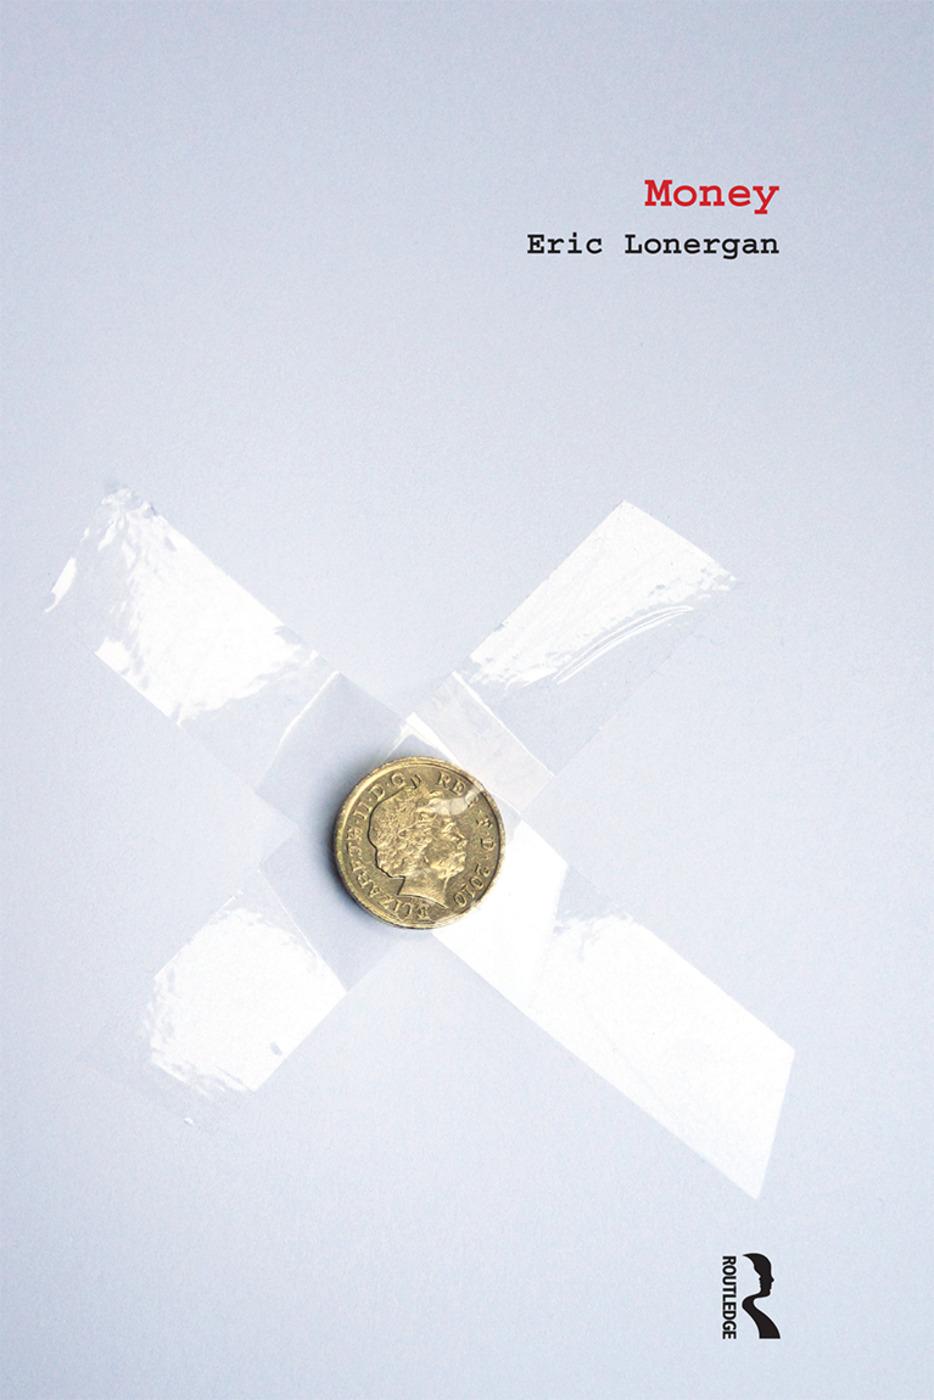 Money book cover